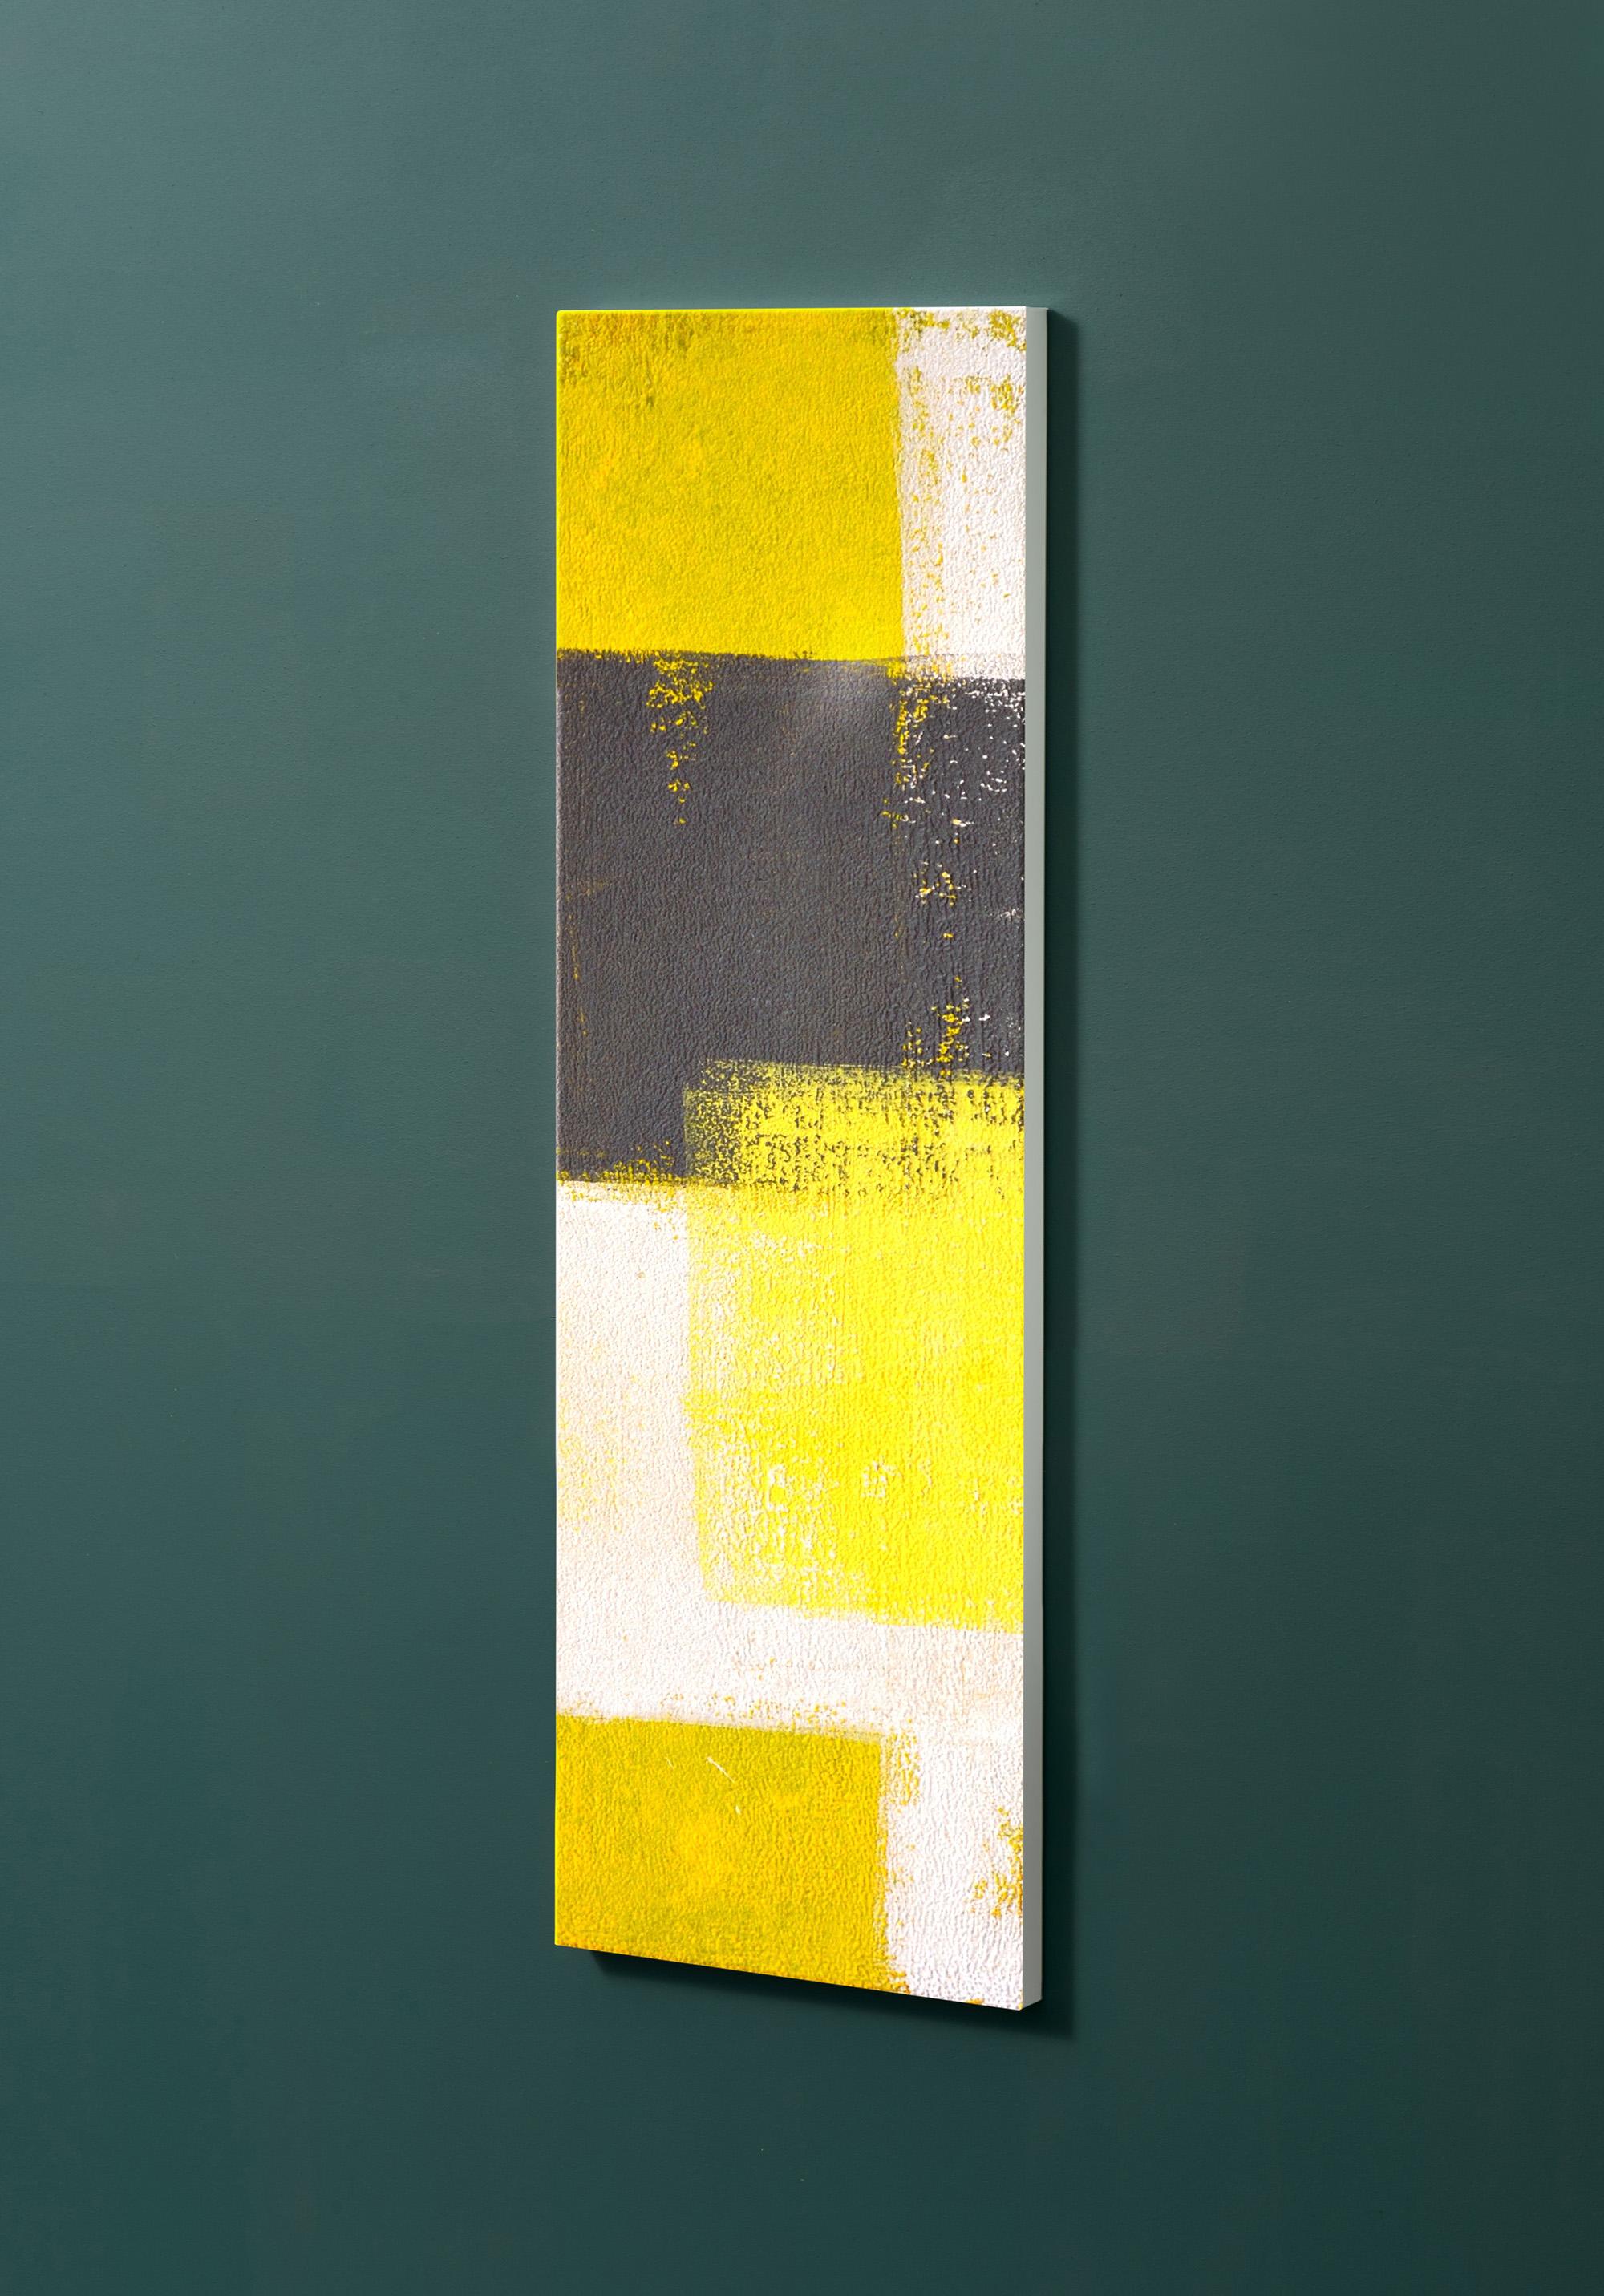 Magnettafel NOTIZ 30x90cm Motiv-Pinnwand M24 Abstrakt Kunst